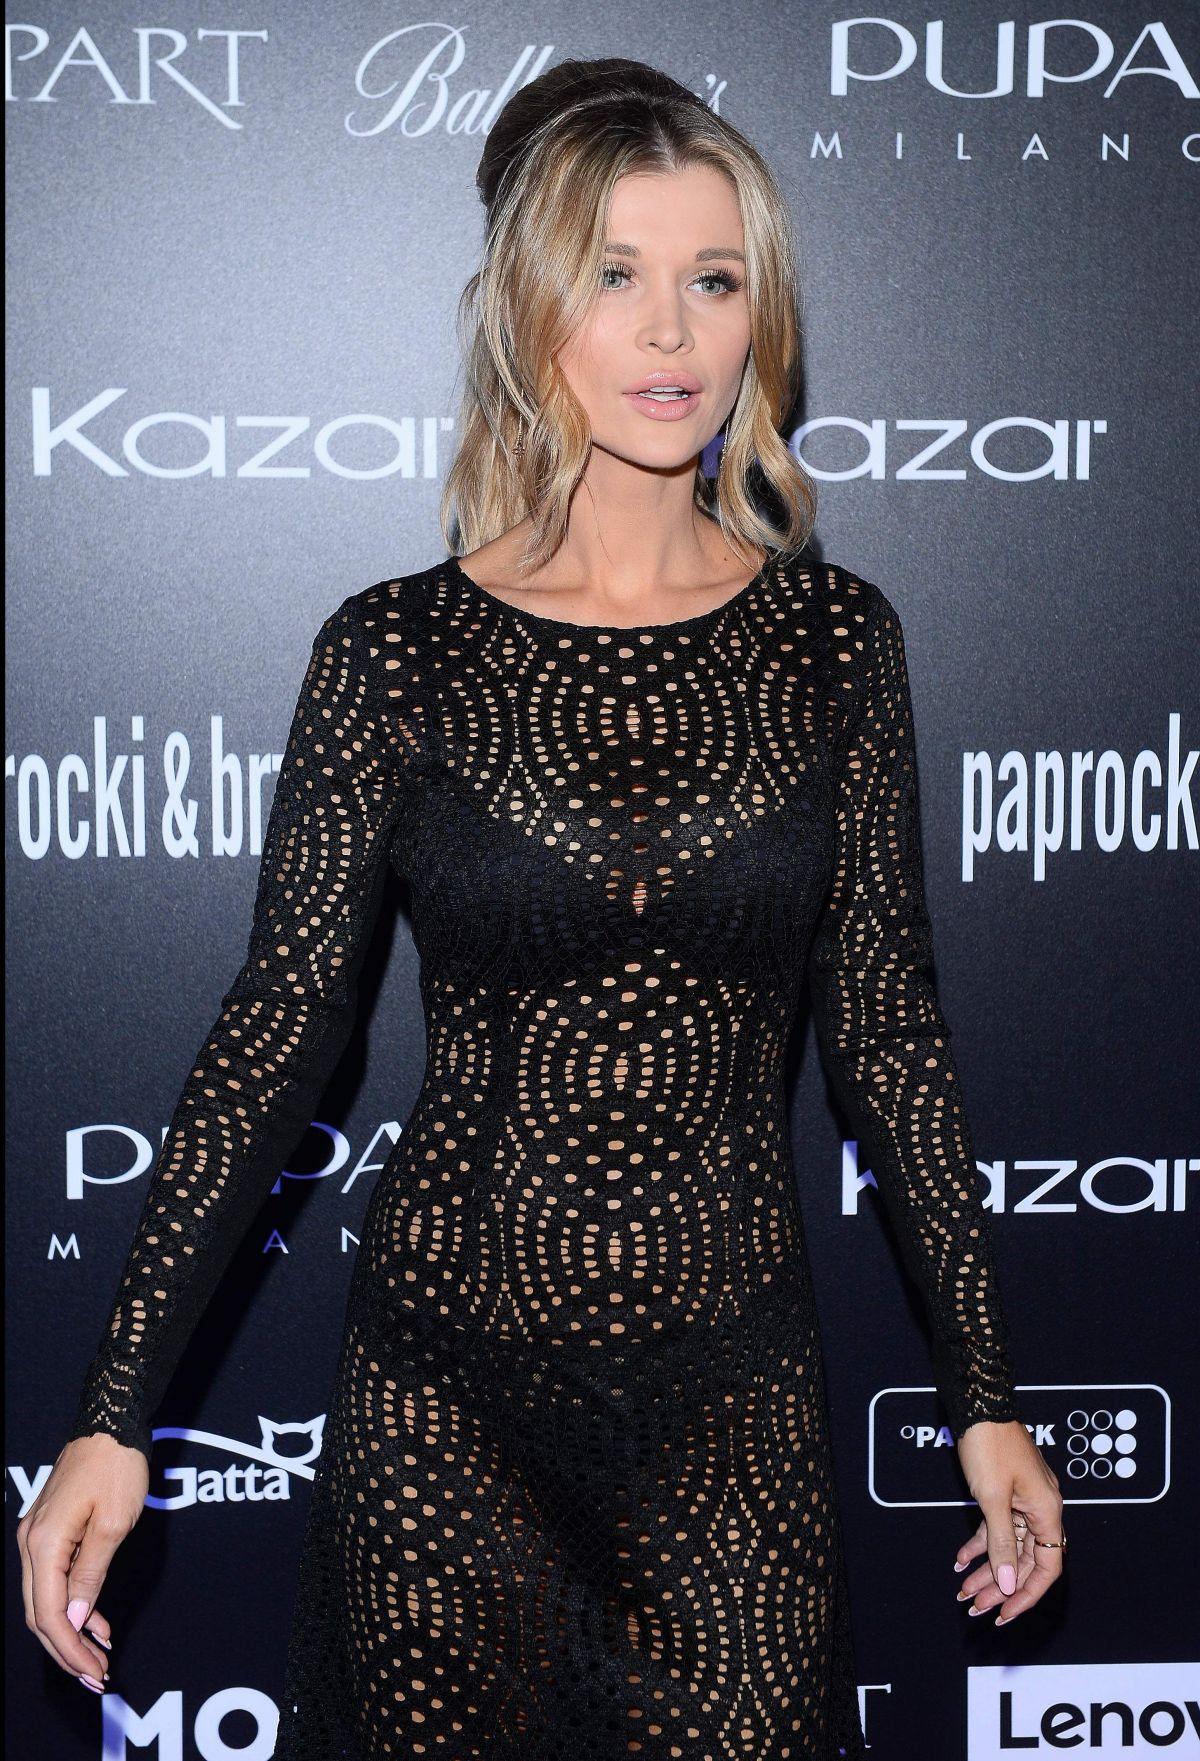 JOANNA KRUPA at Paprocki & Brzozowski Show in Warsaw 02/02/2017